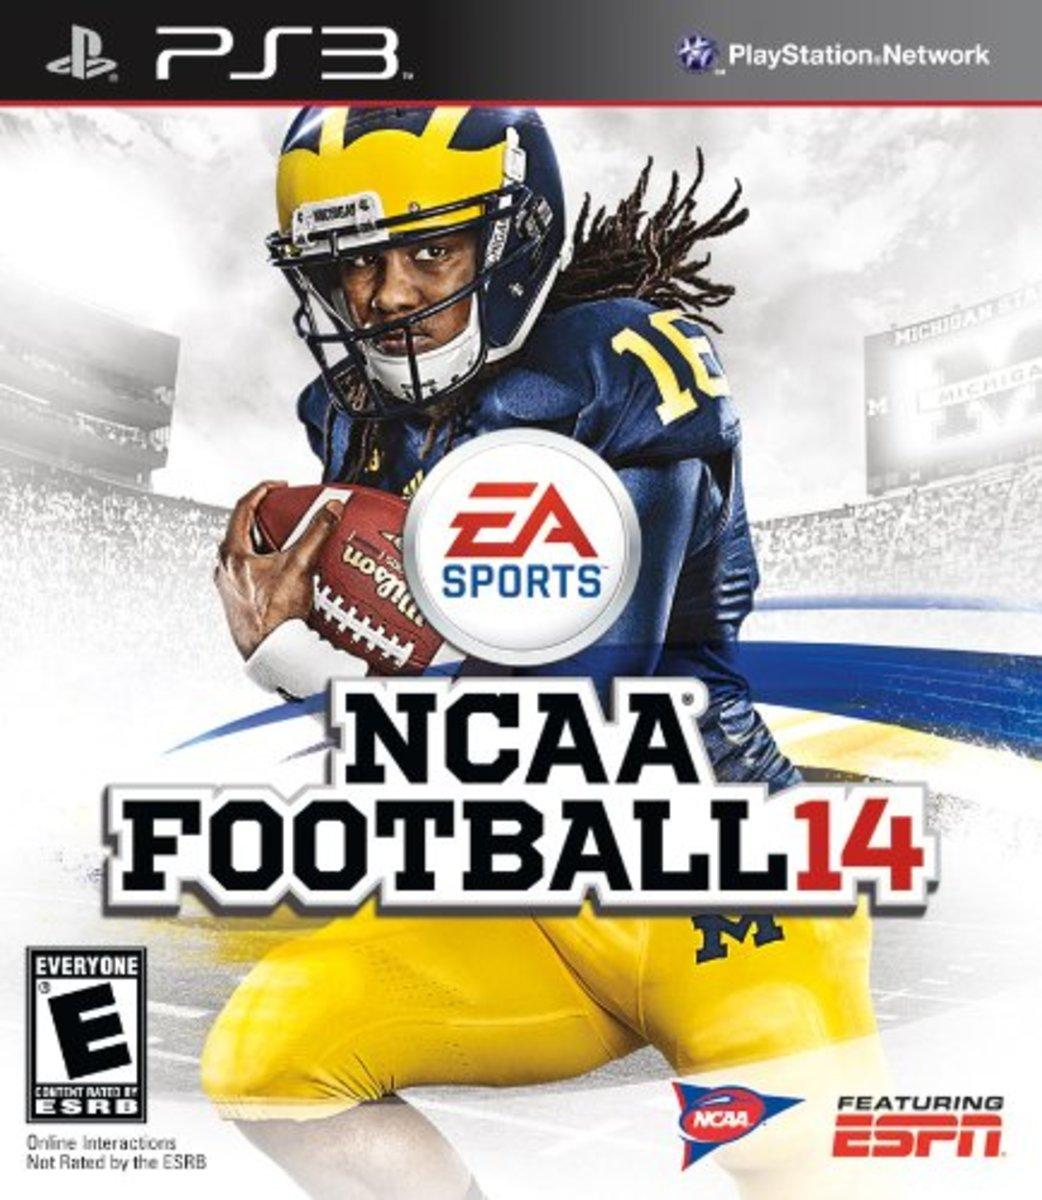 NCAA Football 14 on PS3